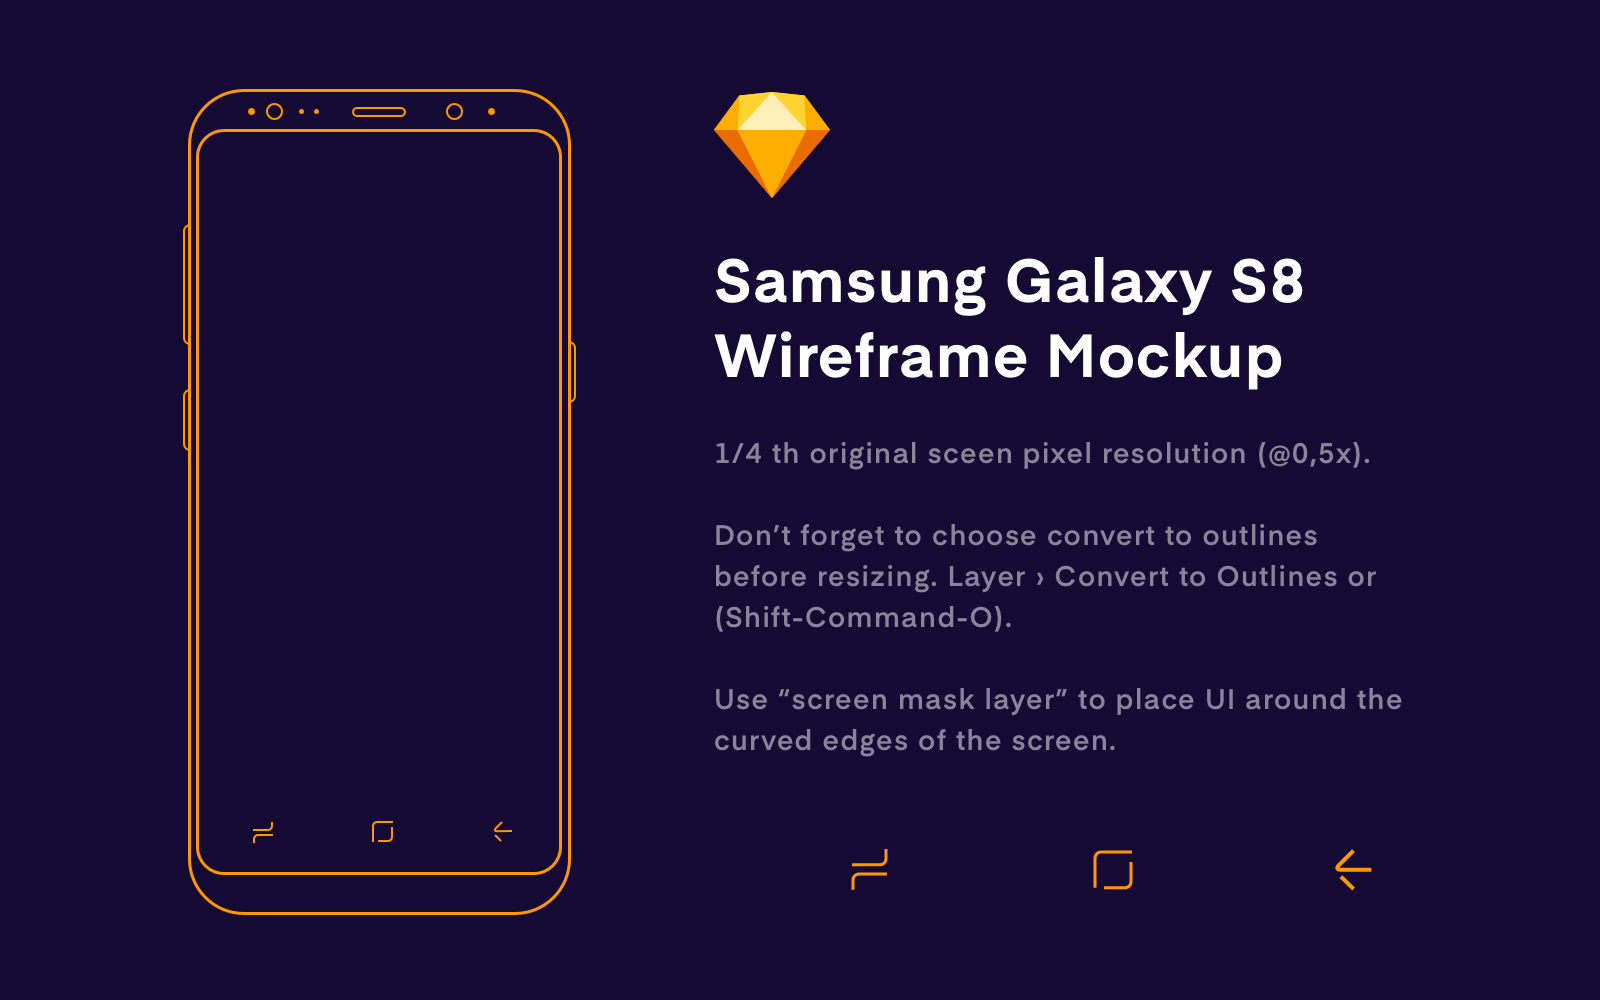 Samsung s8 wireframe presentation